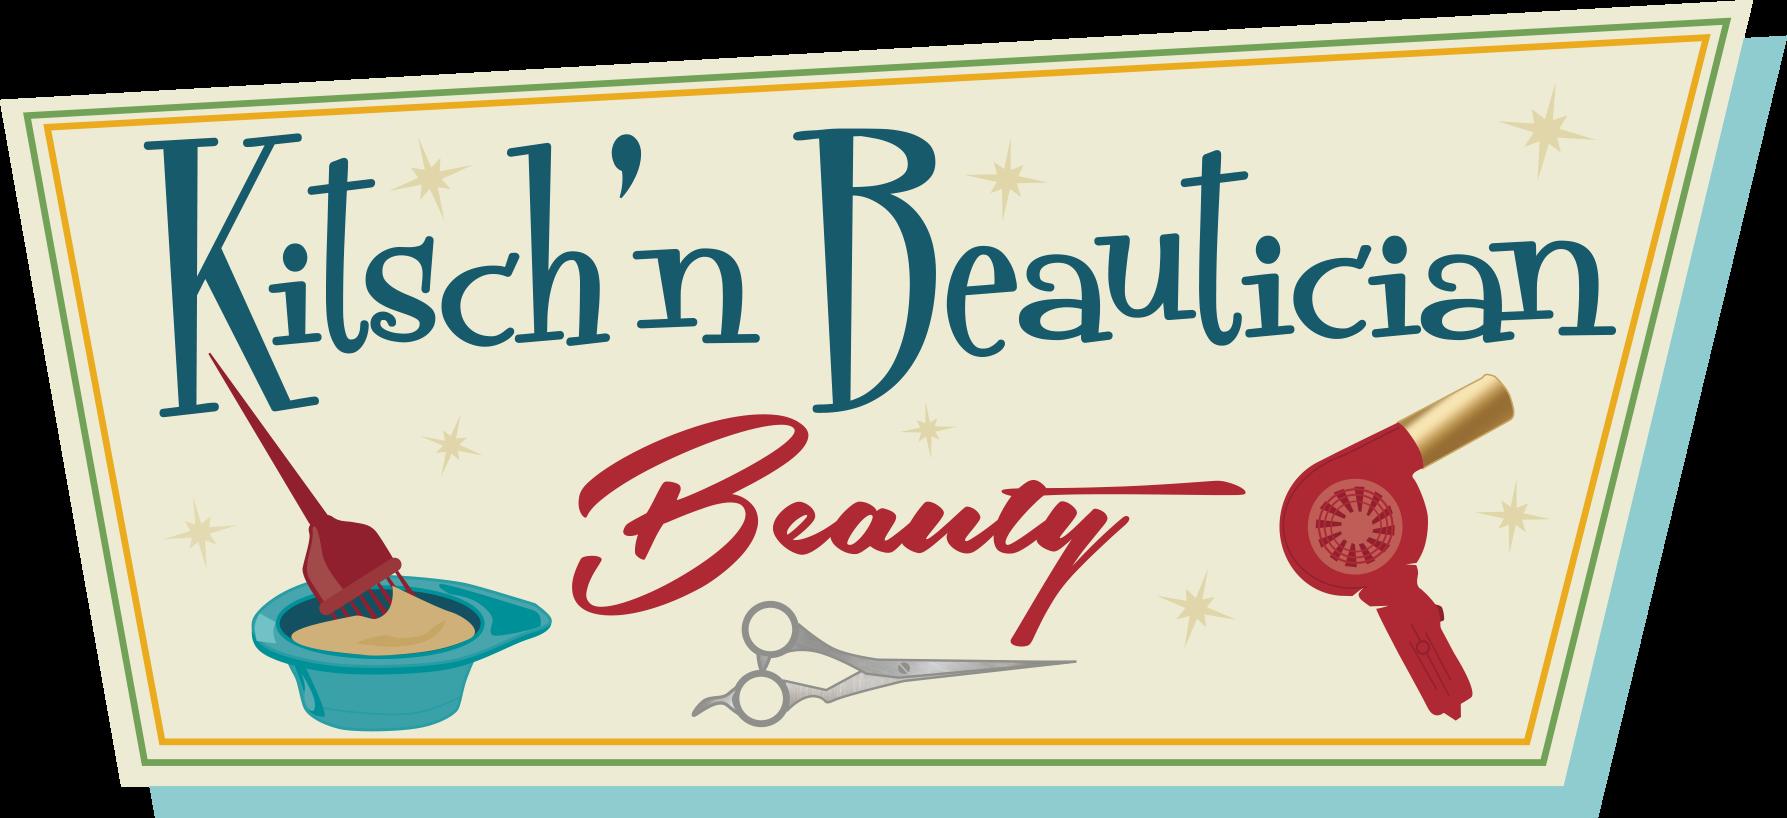 Eclectic, Retro, Eco, Boutique Beauty Parlor logo